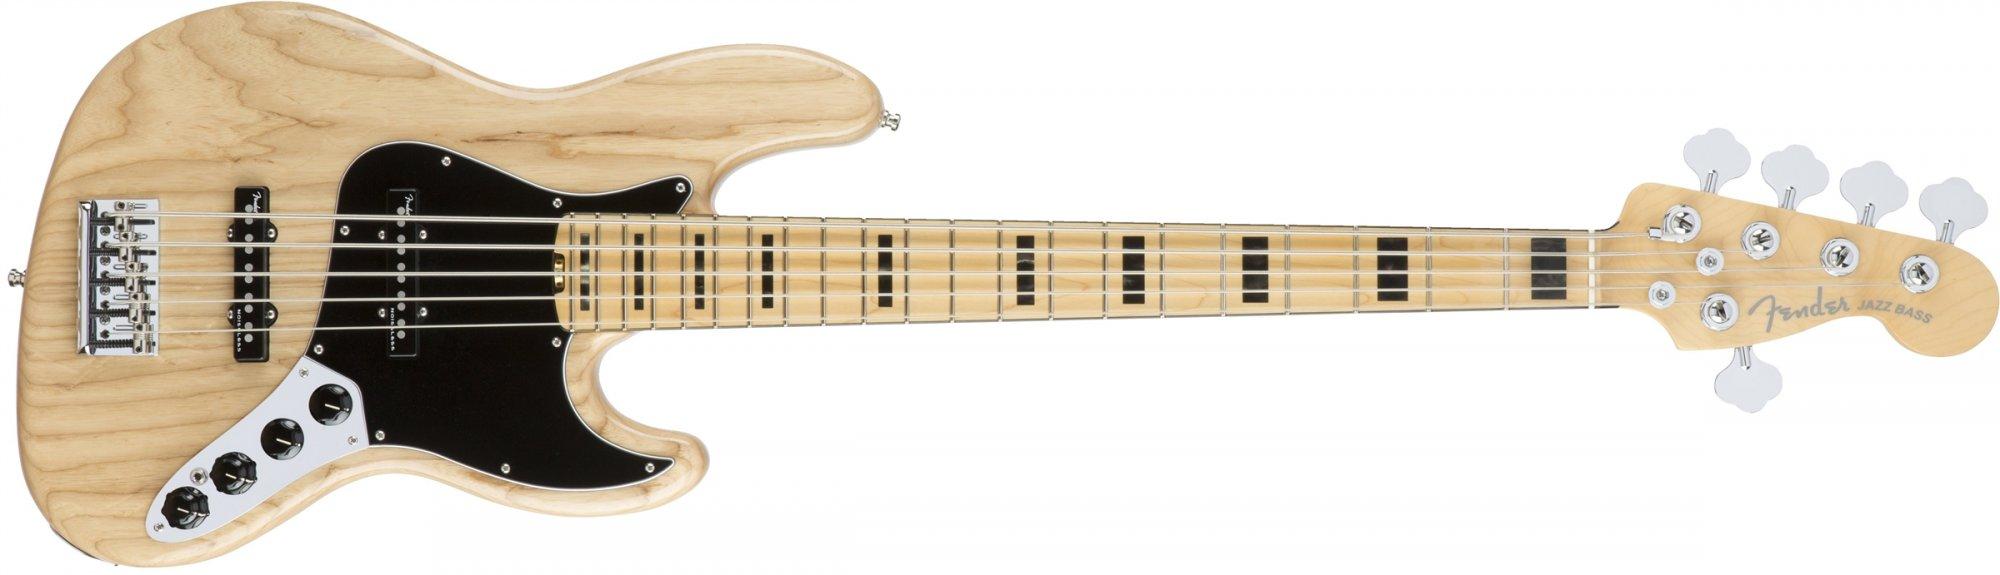 American Jazz  V Elite Bass ASH MN Natural